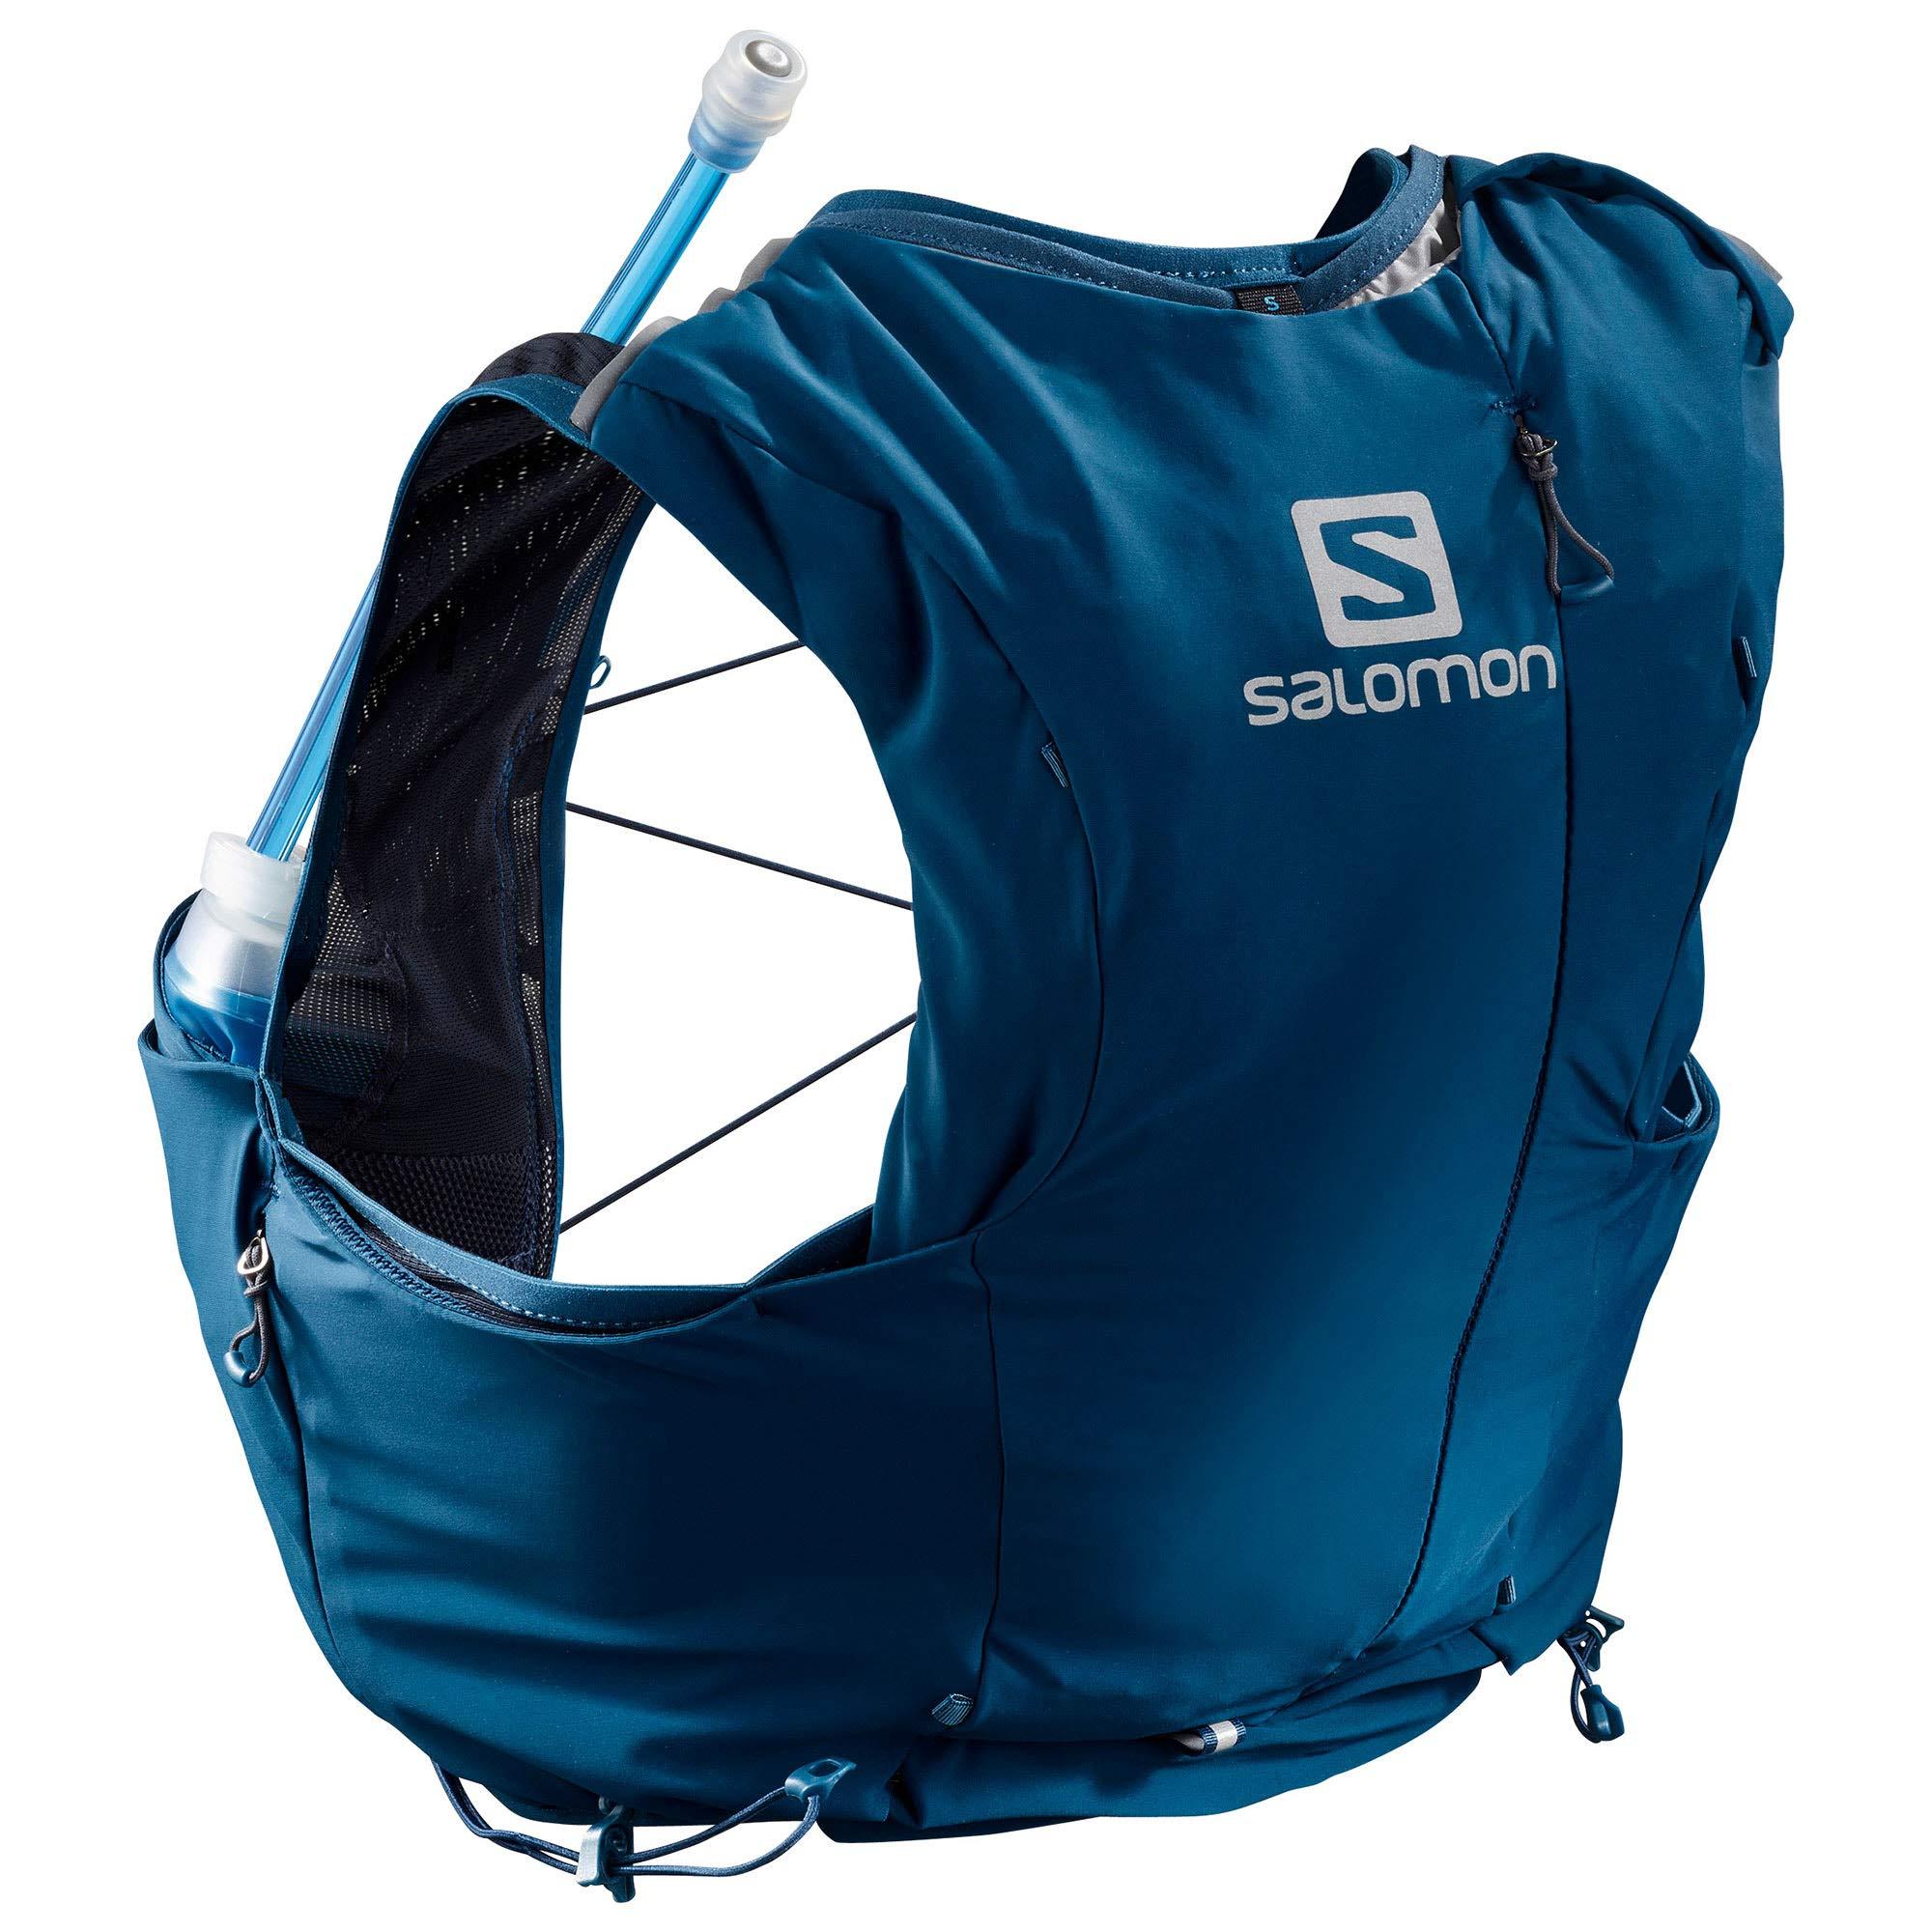 Salomon Women's Adv Skin 8 Set Hydration Stretch Pack, Poseidon/Night, XX-Small